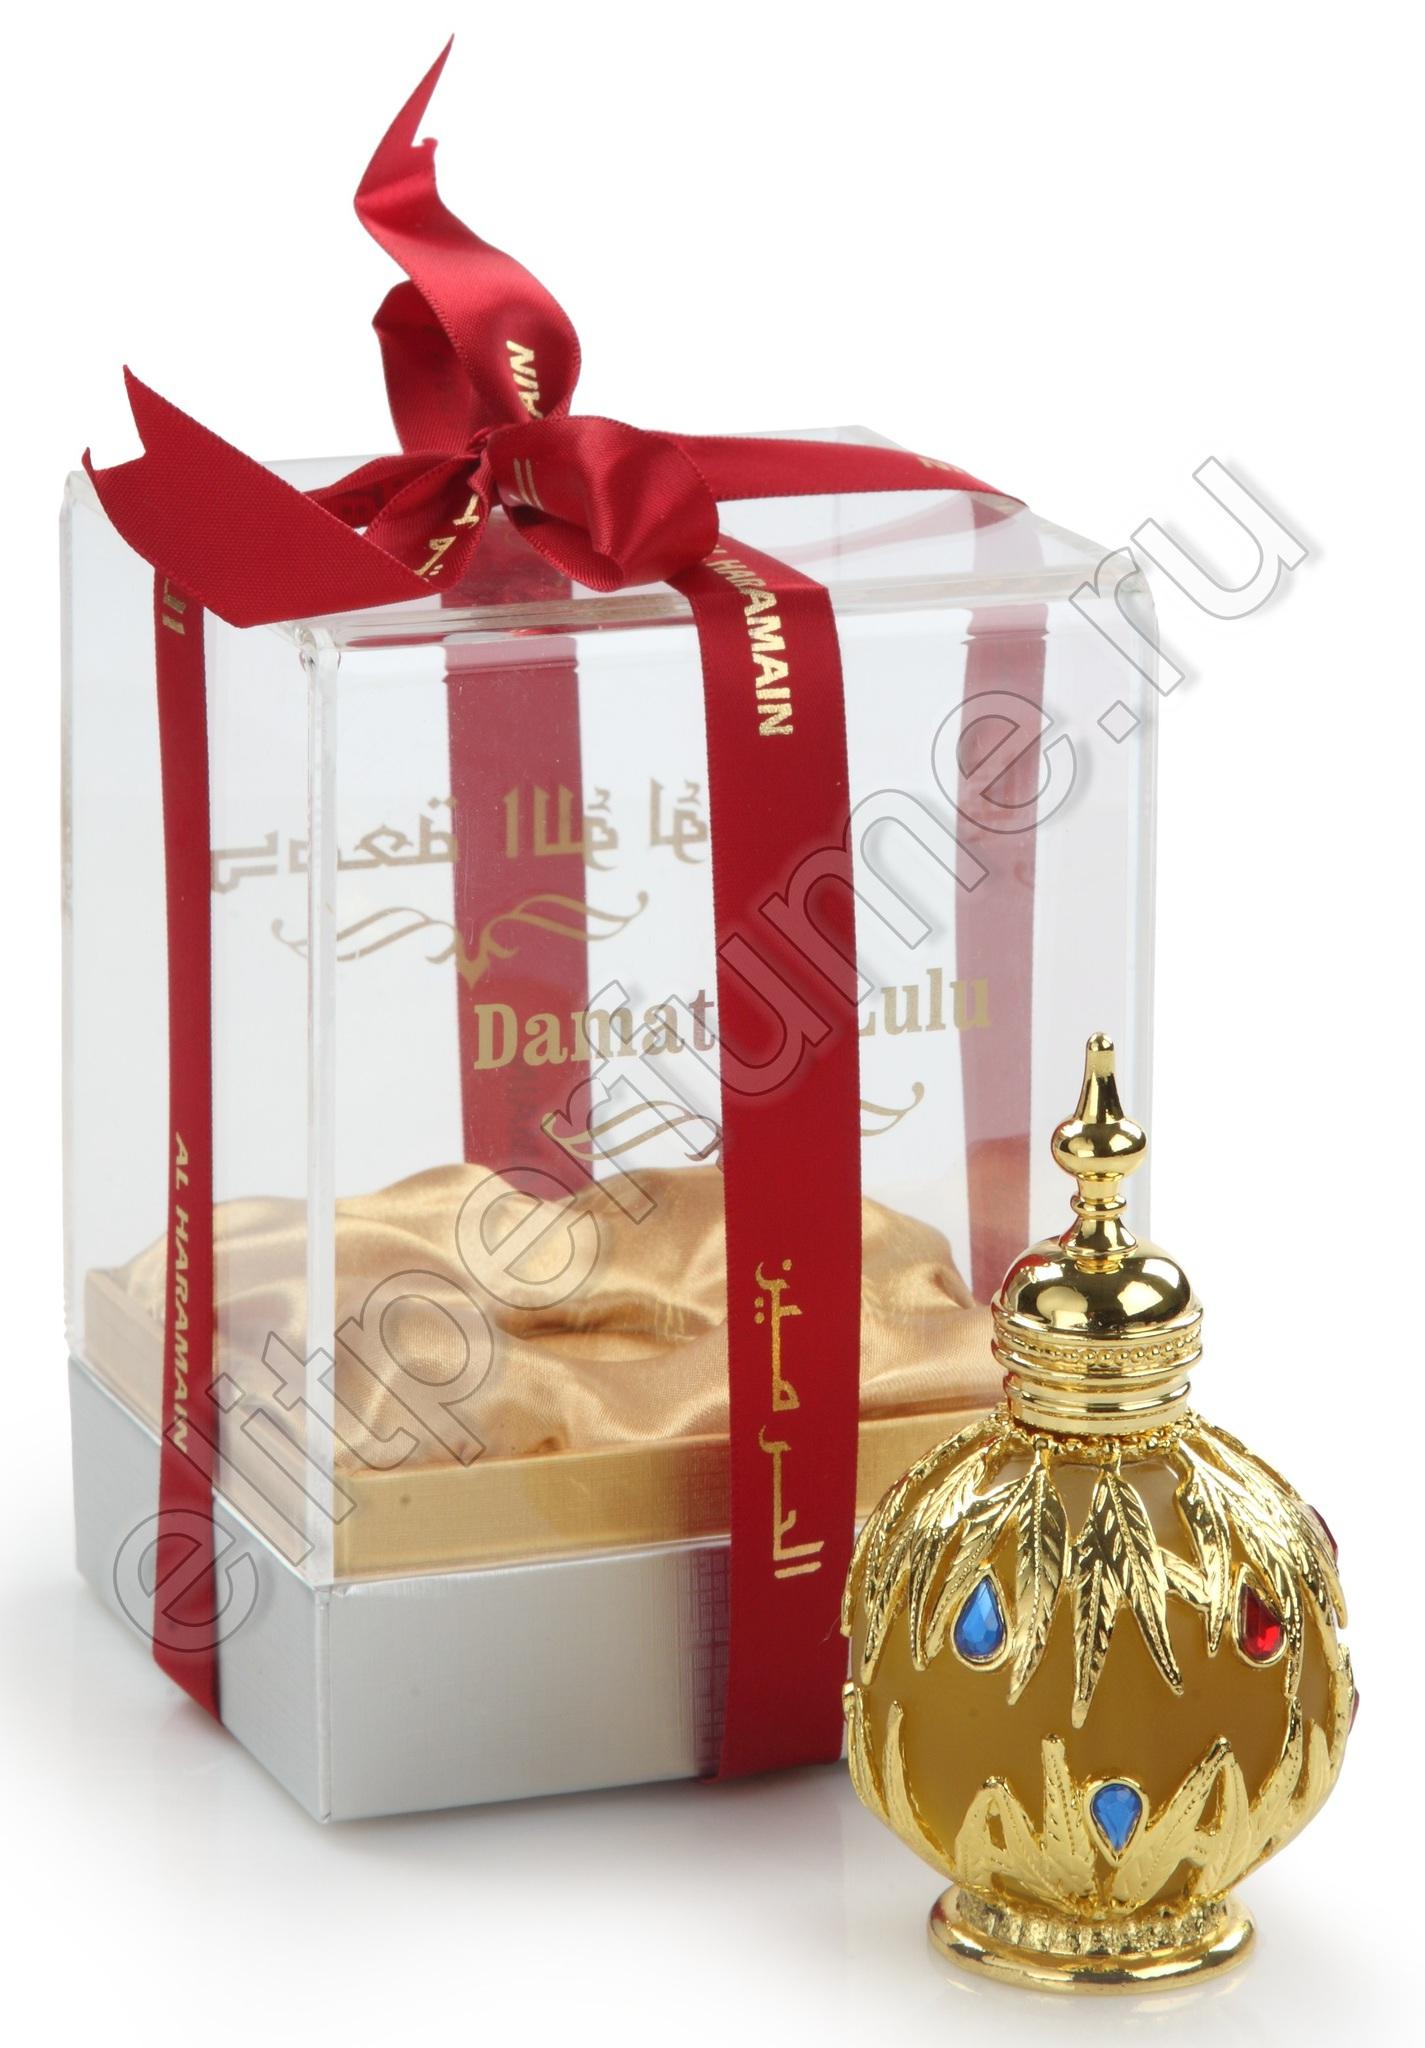 Пробники для духов Дамат Аль-Лулу Damat Al Lulu 1 мл арабские масляные духи от Аль Харамайн Al Haramin Perfumes